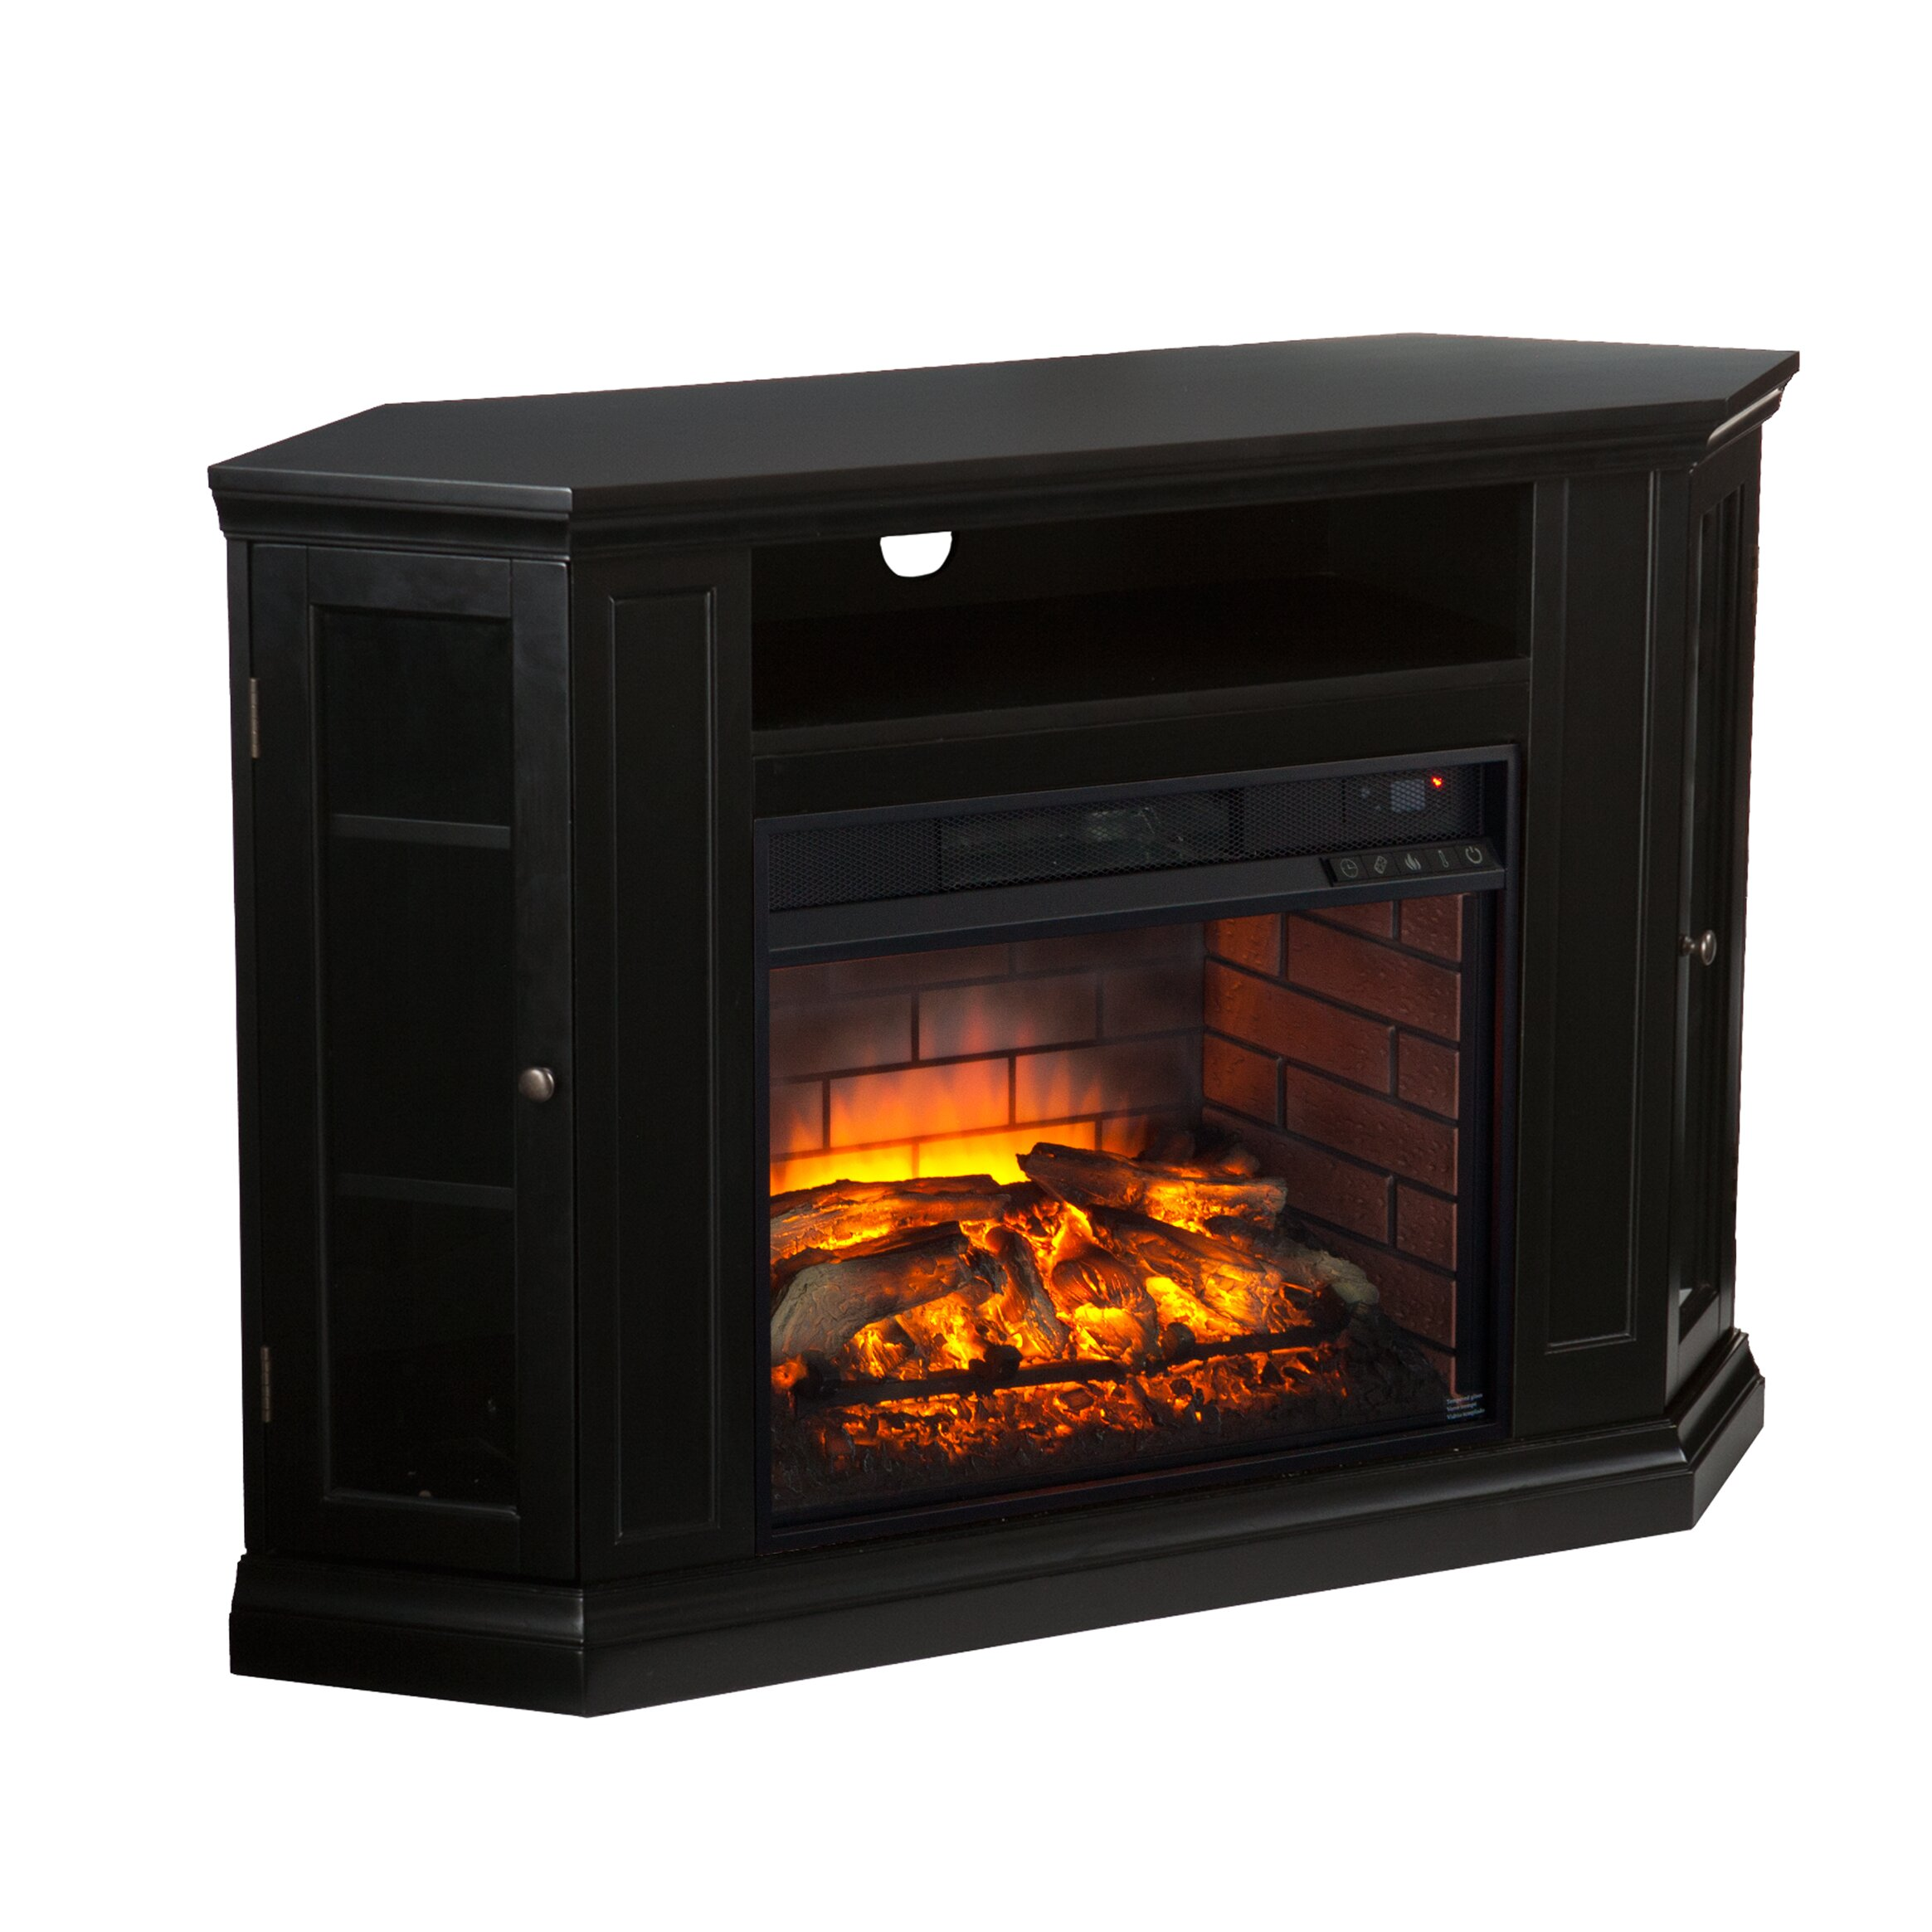 Wildon Home Chamberlain Convertible Media Infrared Electric Fireplace Reviews Wayfair